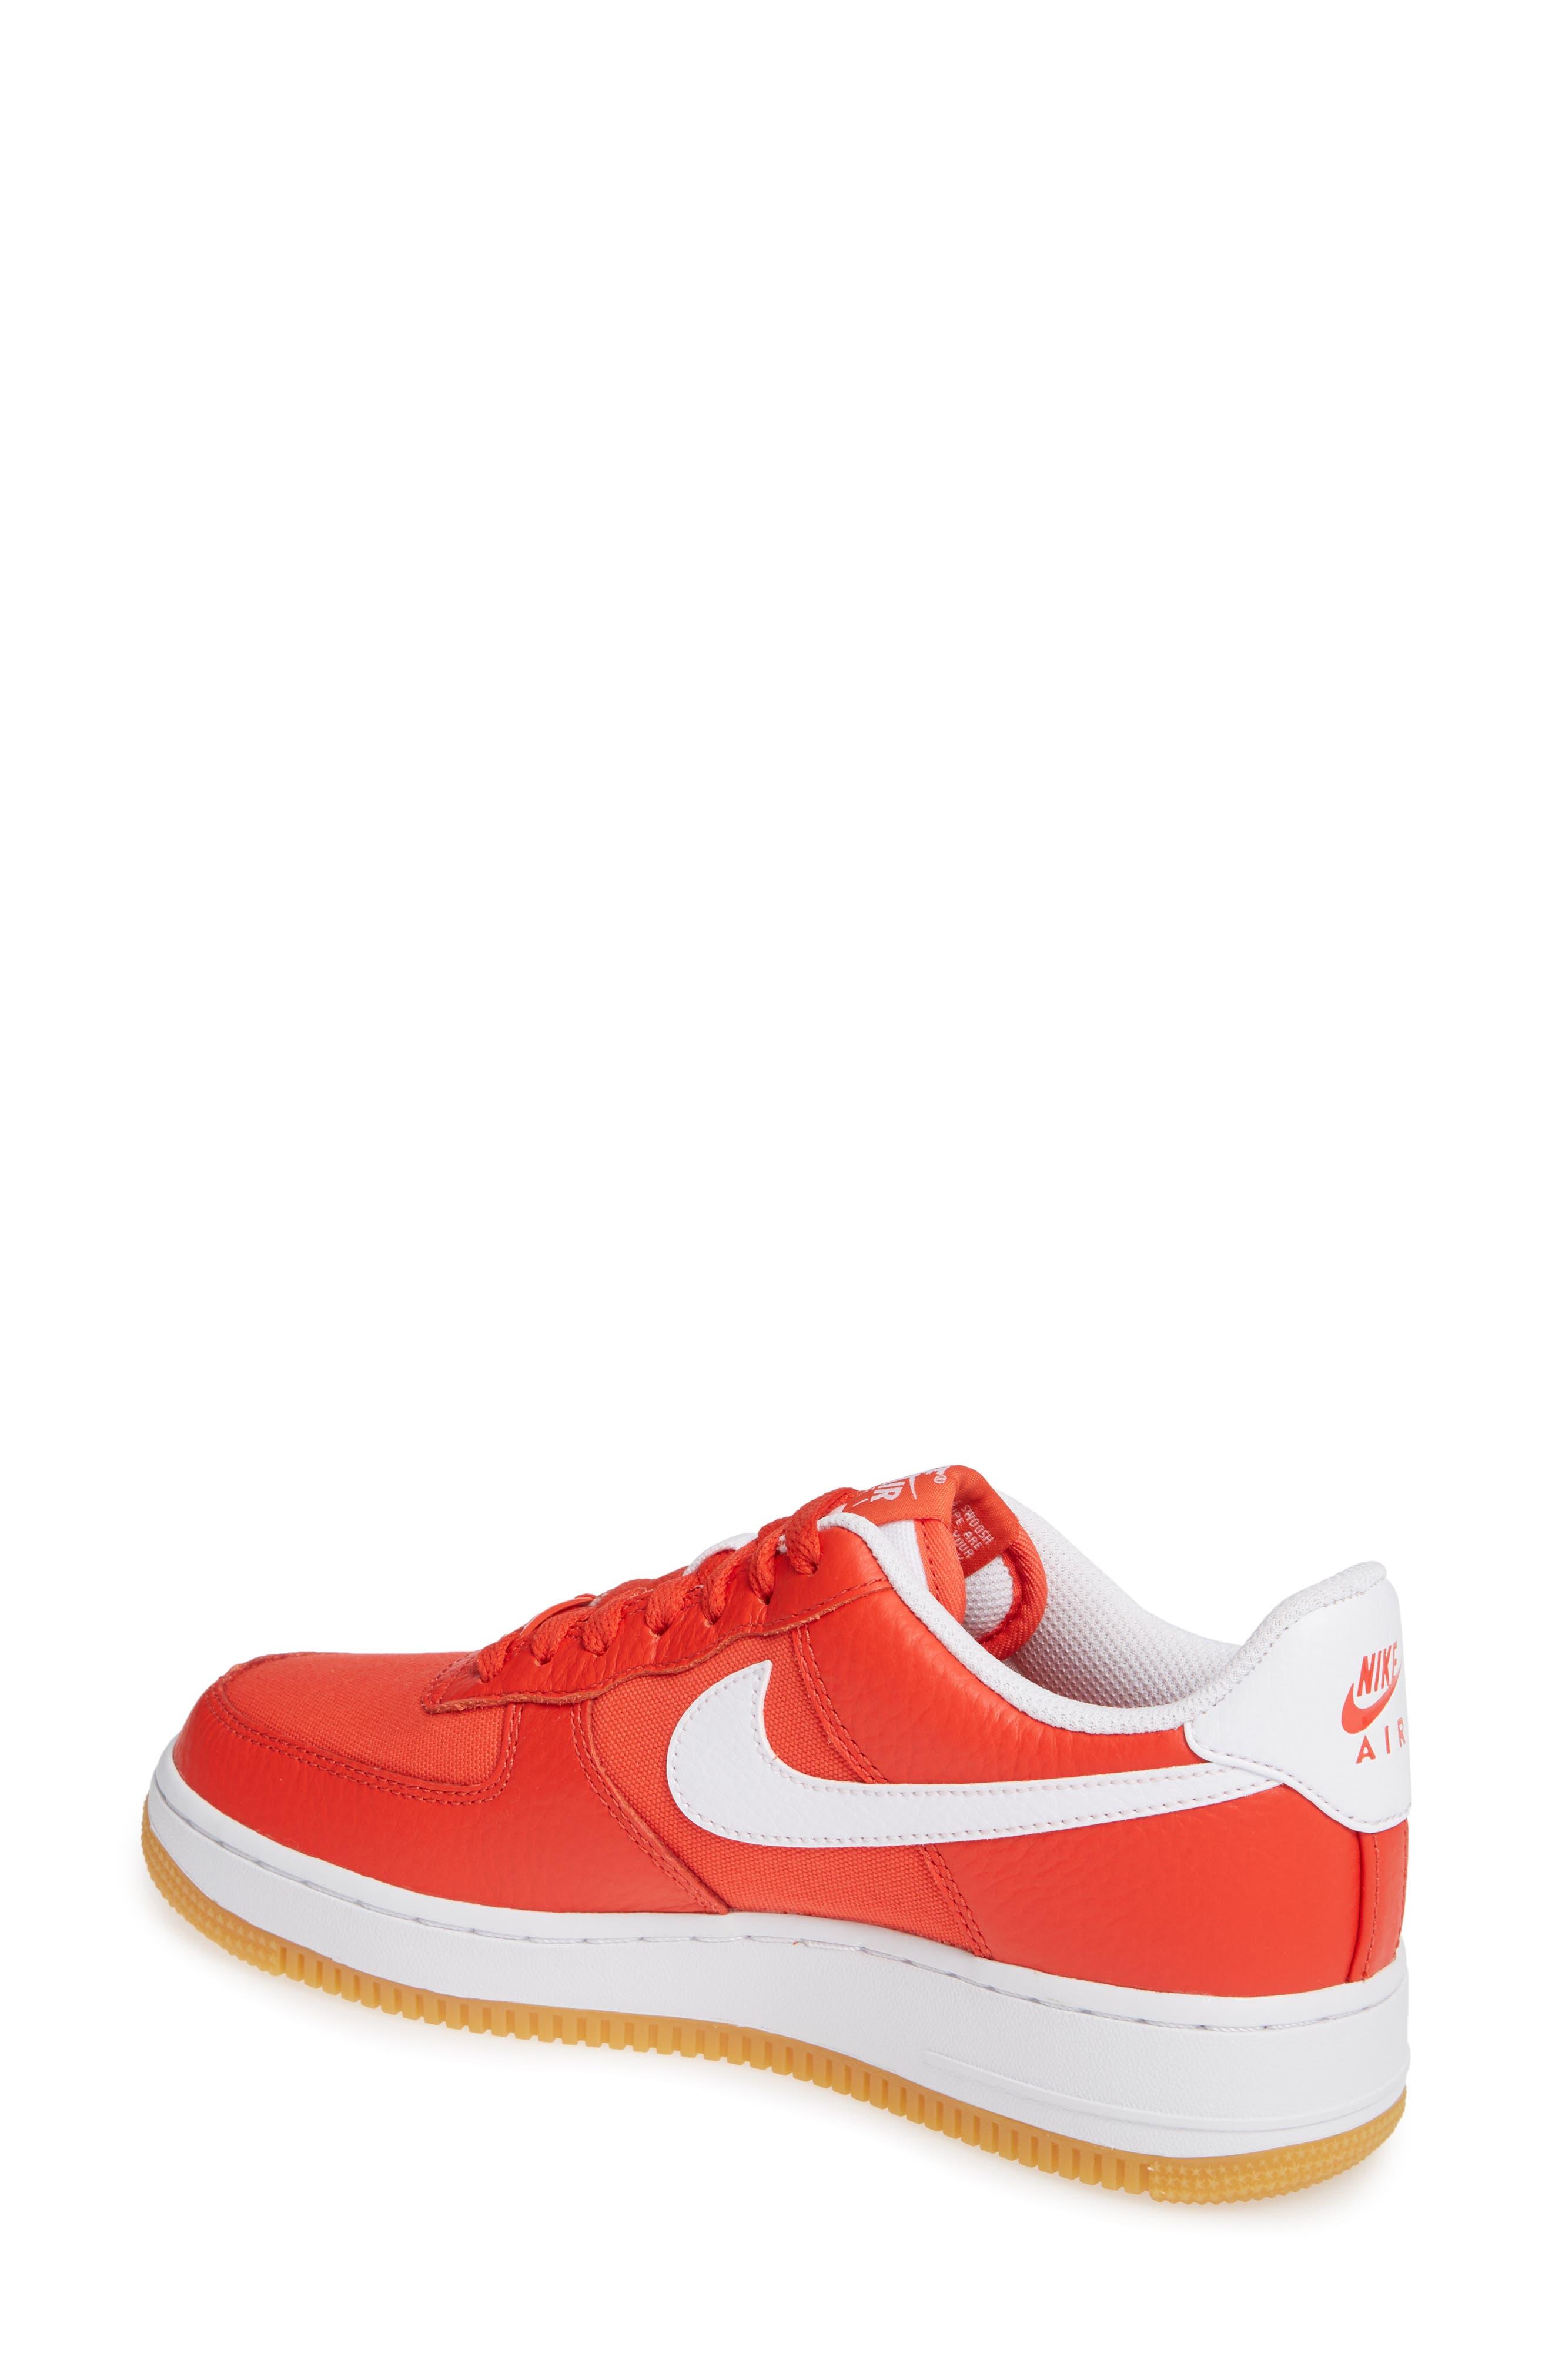 Air Force 1 '07 Premium Sneaker,                             Alternate thumbnail 2, color,                             Red/ White/ Light Brown